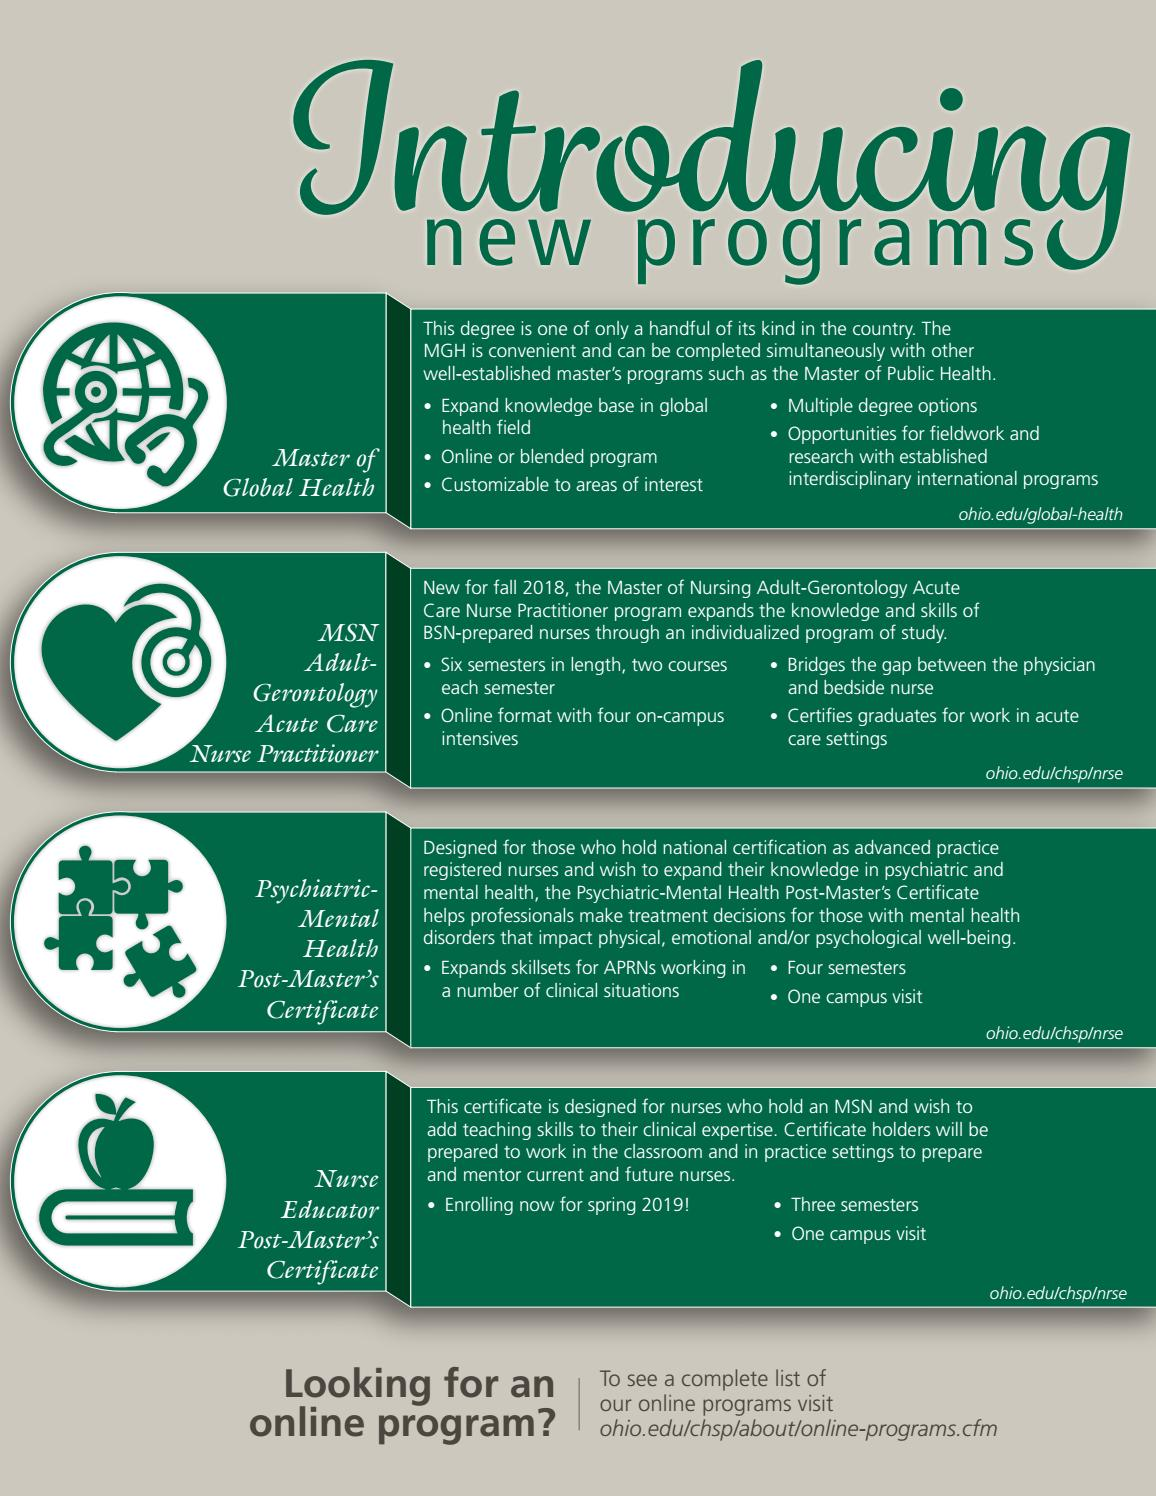 Connect Magazine Spring 2018 Ohio University Chsp By Ohio